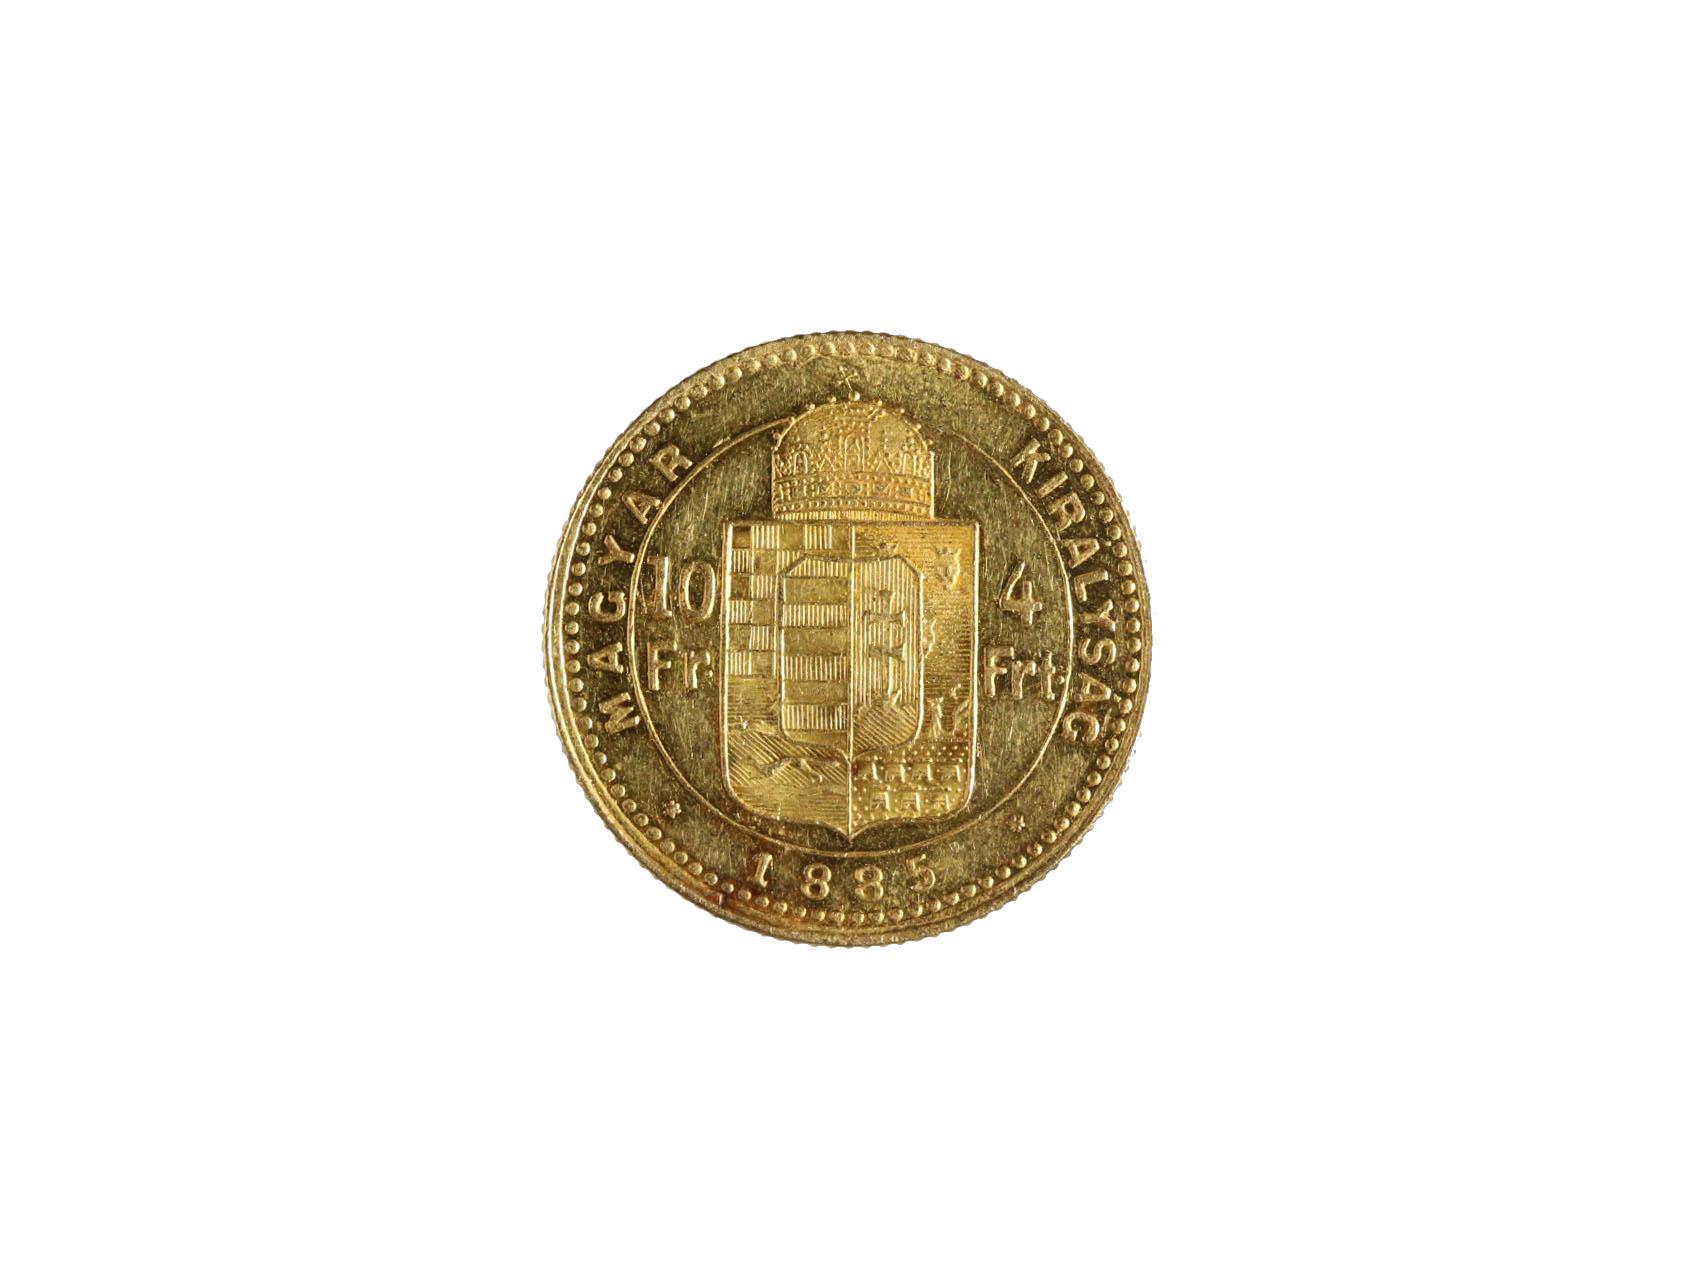 František Josef I. 1848-1916 - 4 Zlatník 1885 K.B., N124, nádherný stav